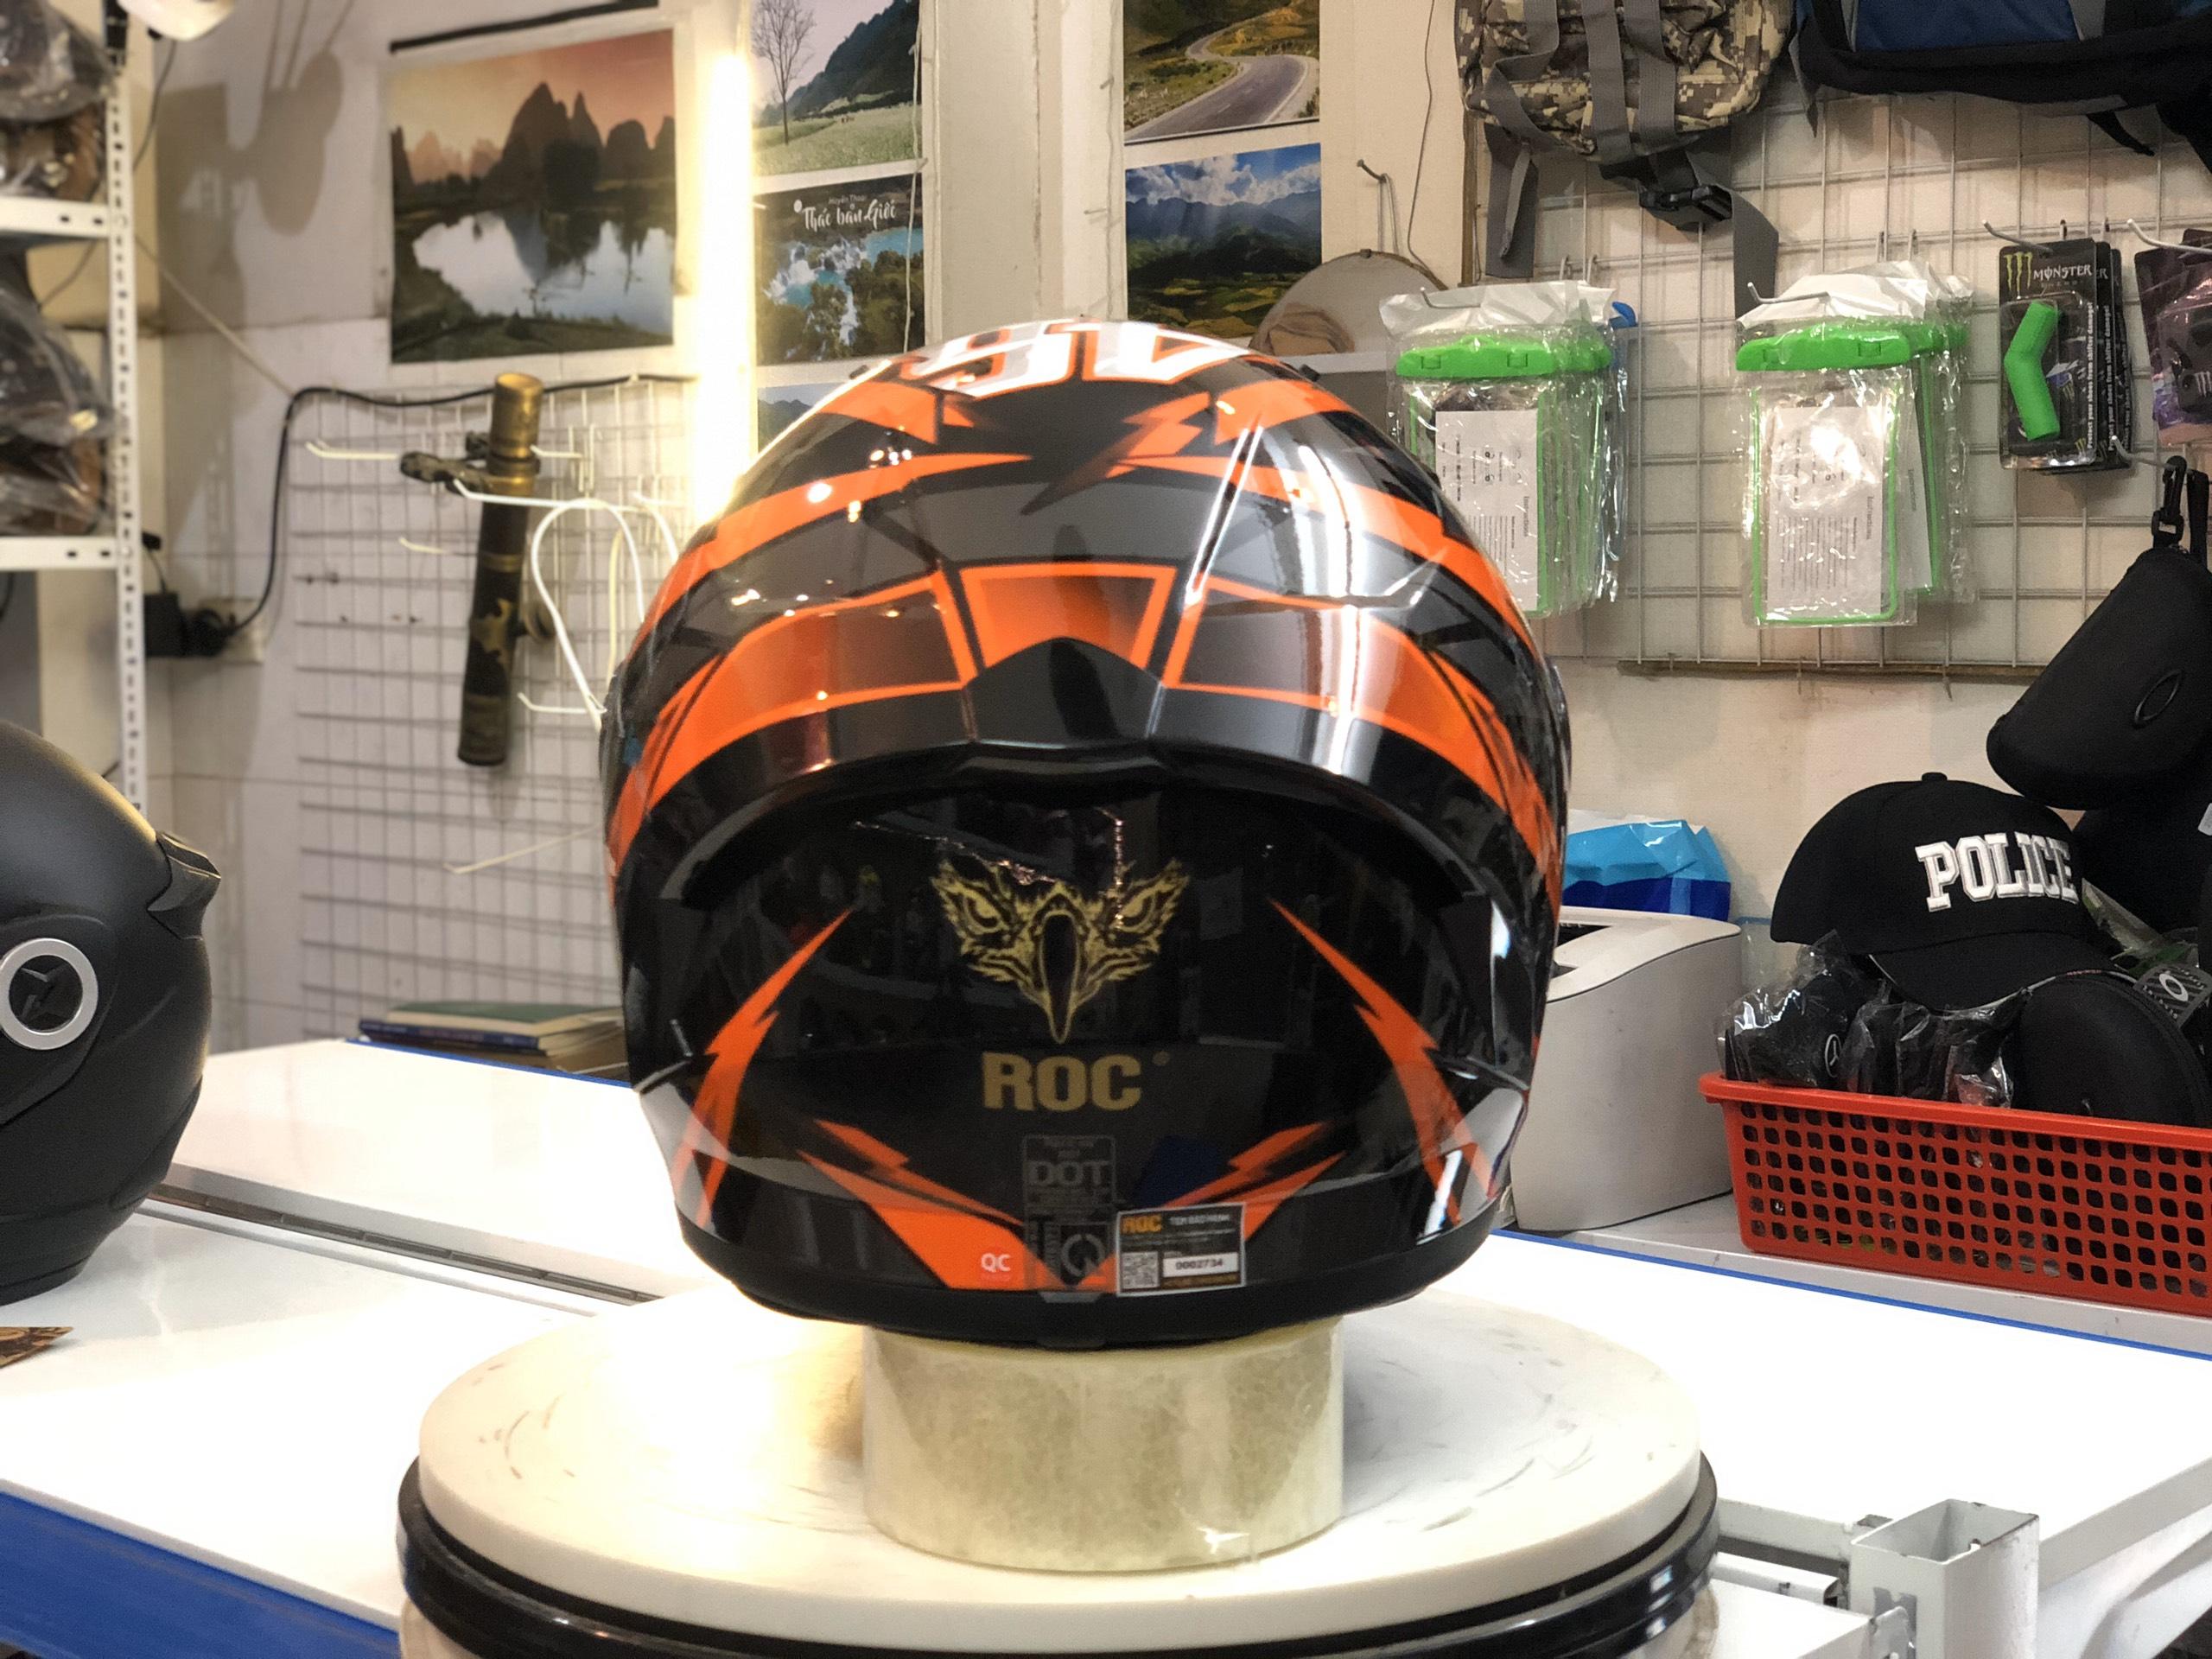 Mũ bảo hiểm Roc R01 cam đen (3)